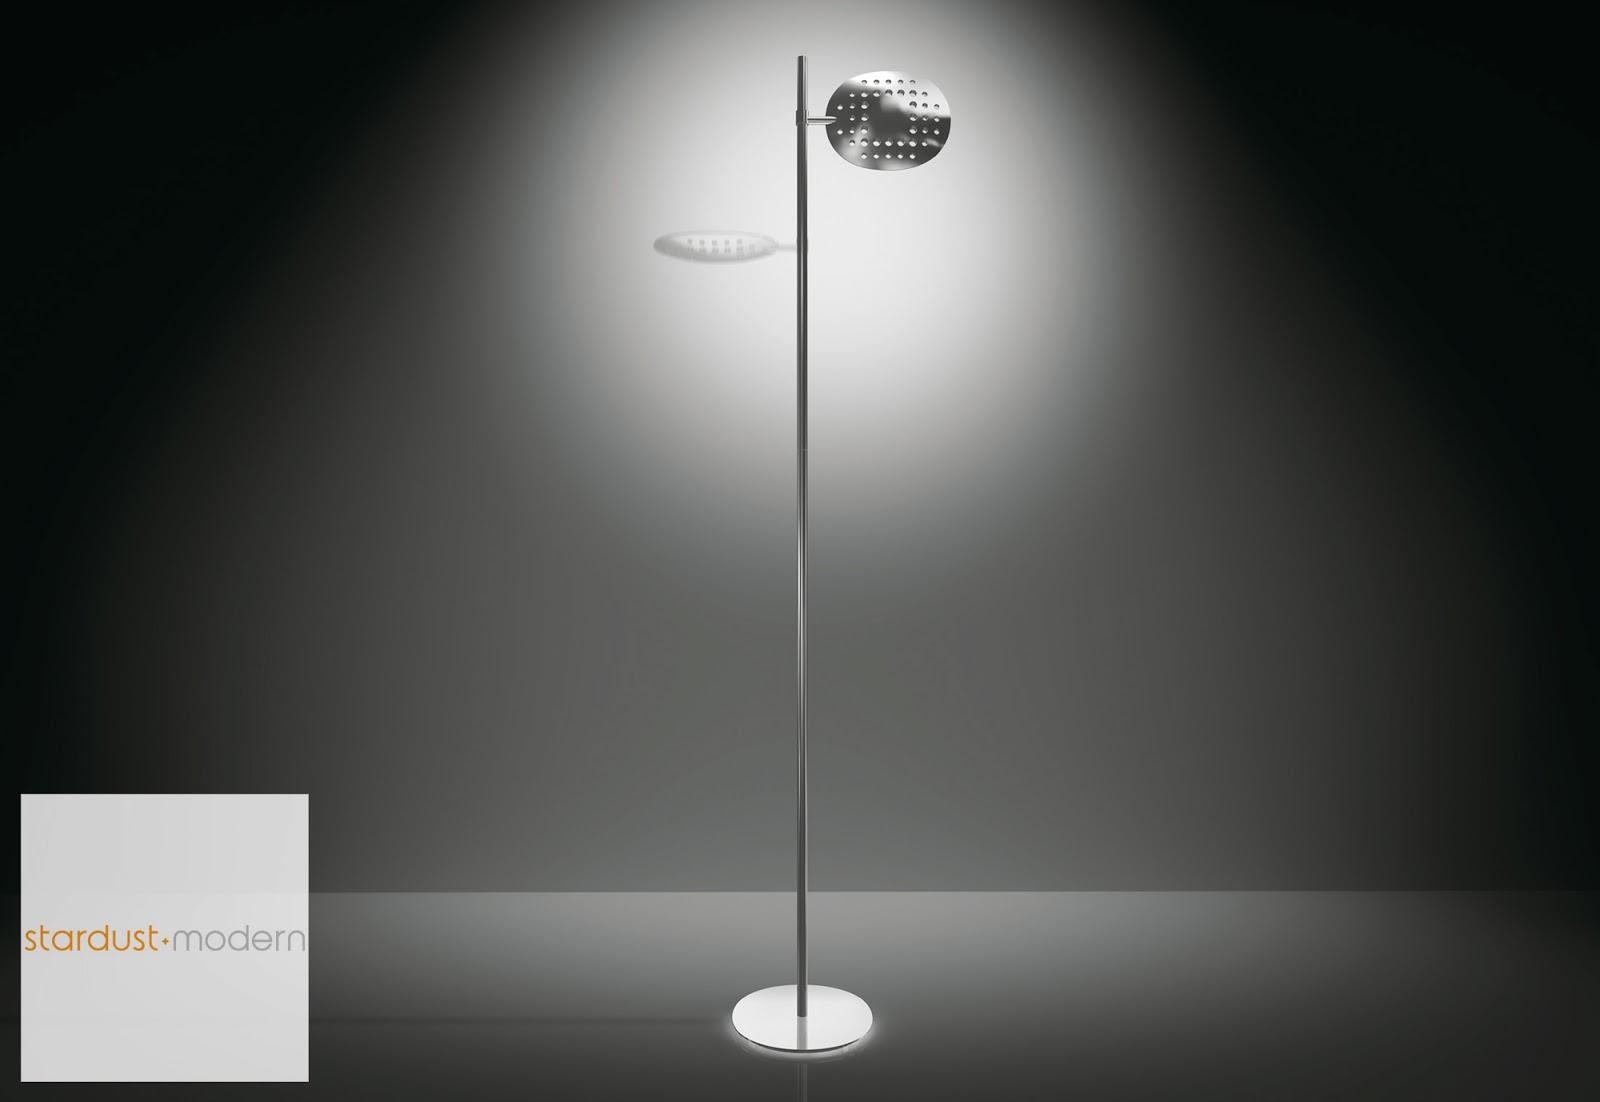 Reall Modern Flooor Standing Reflector Light Floor Lamp